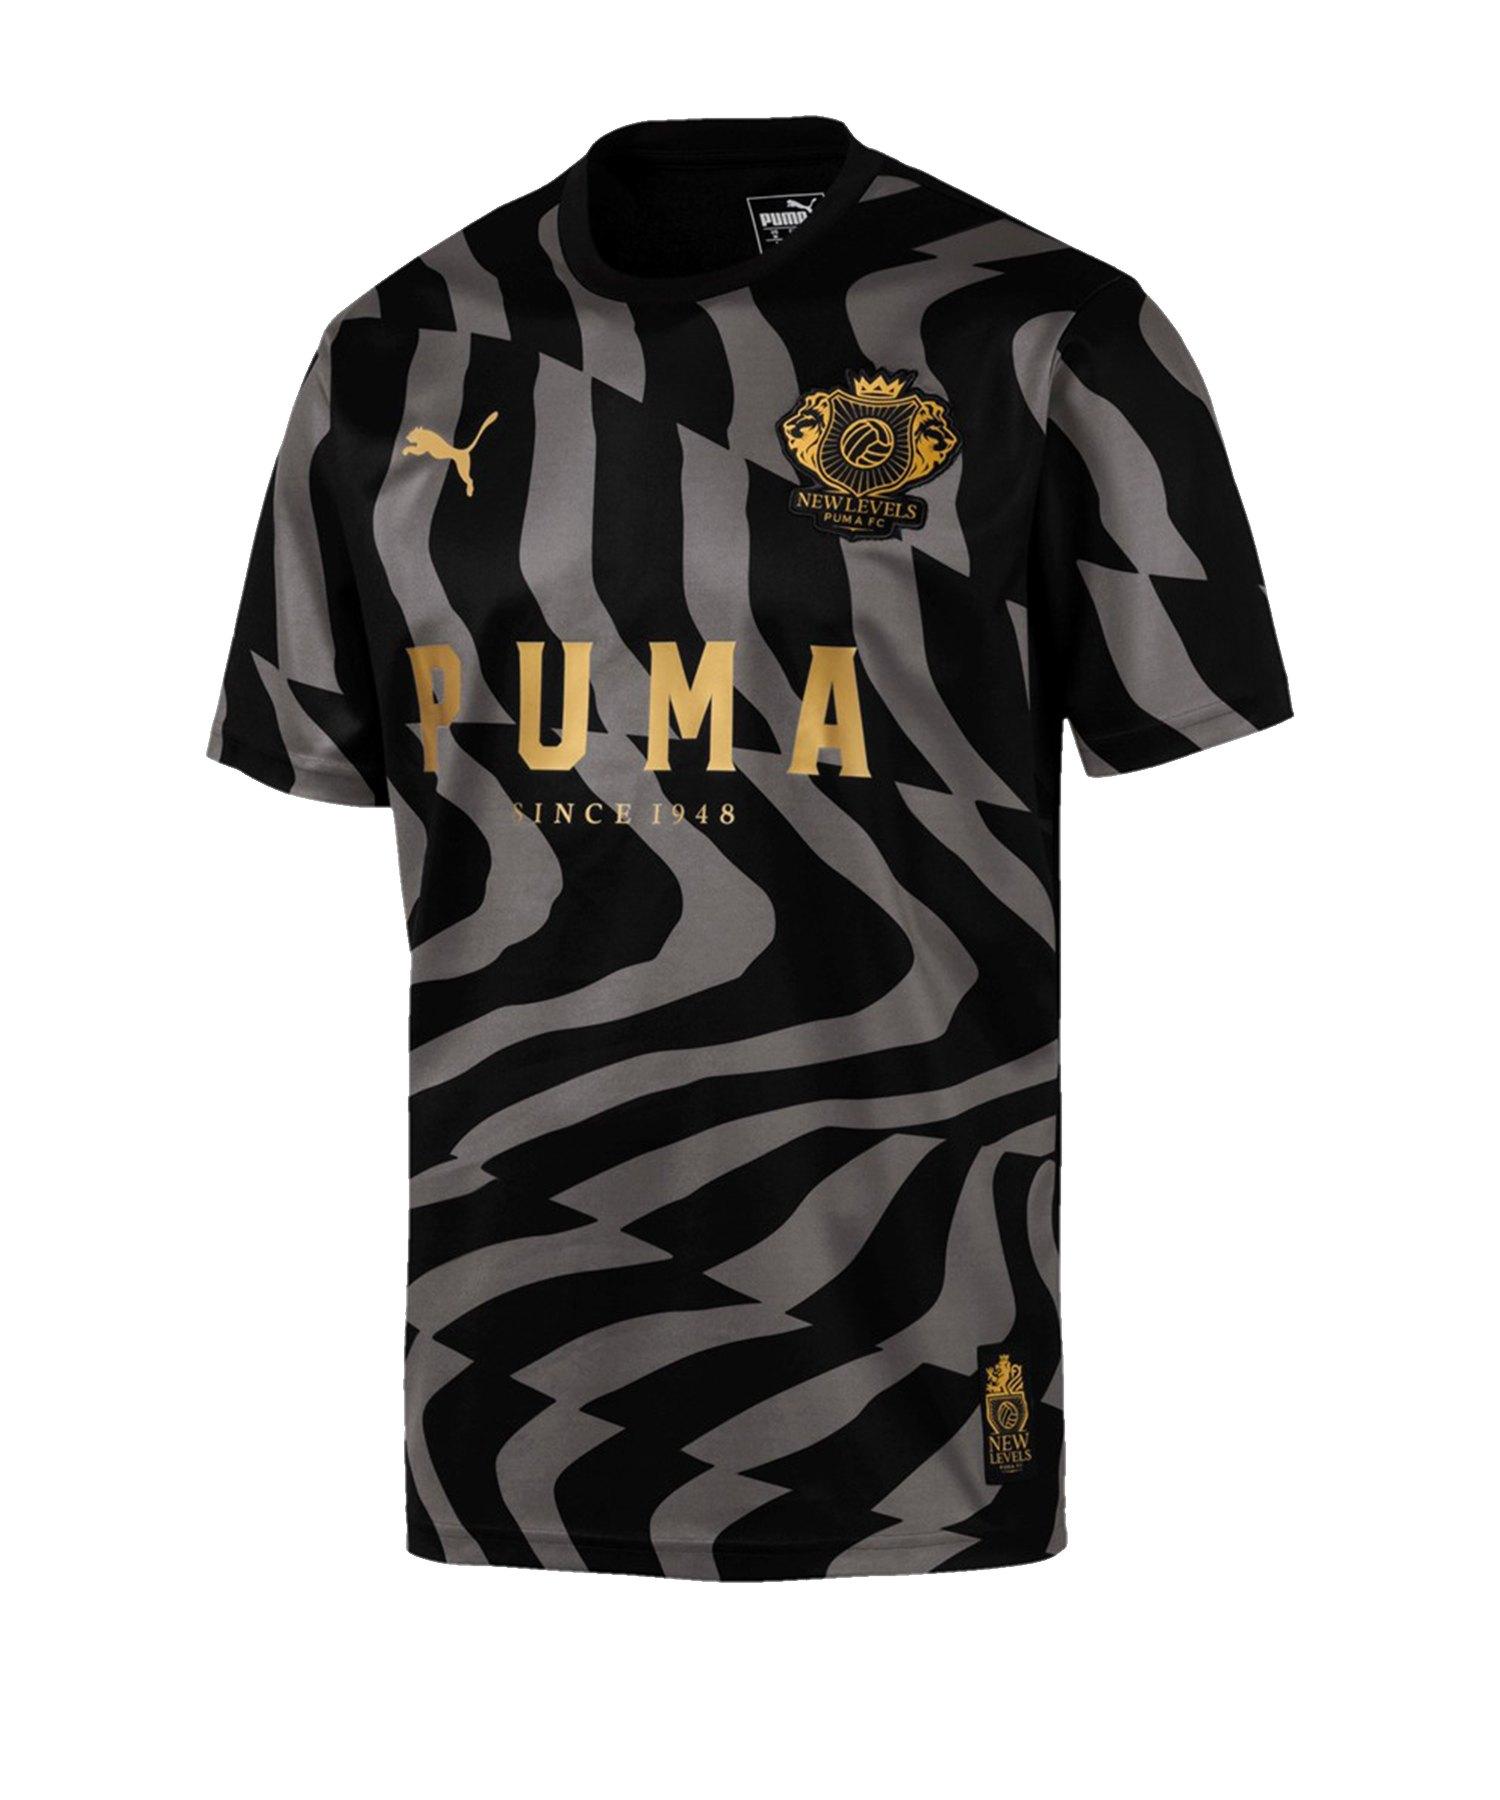 PUMA Psychedelic Jersey T-Shirt Schwarz Grau F001 - schwarz